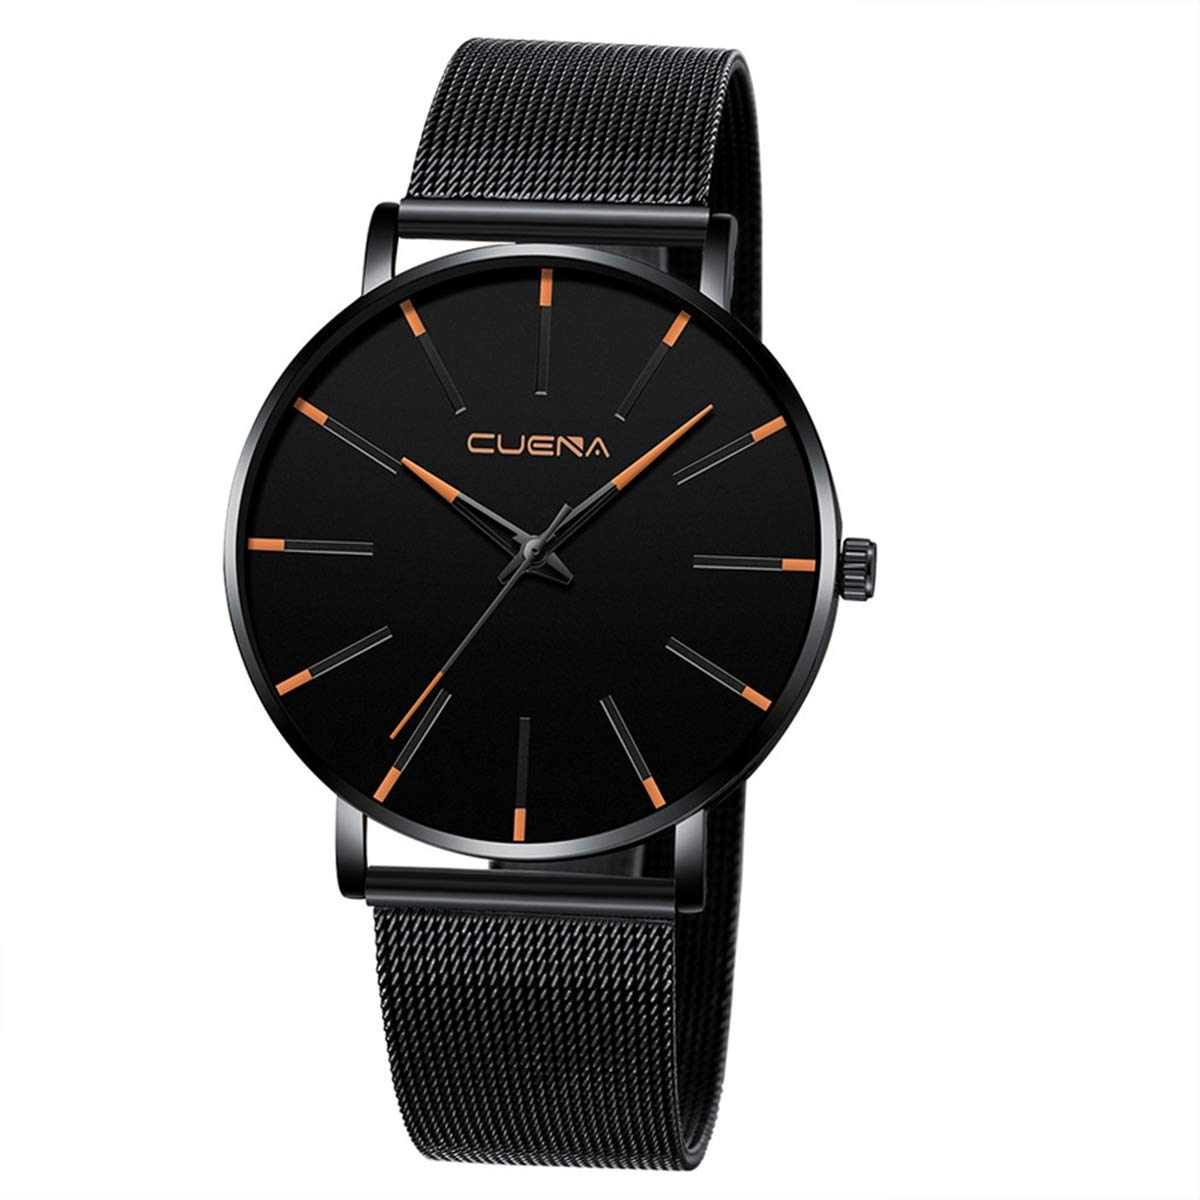 ZODRQ Men's Watch,Fashion Watches Stainless Steel Mesh Wrist Watch Casual Wristwatch Quartz Watch for Men Gift (C) by ZODRQ